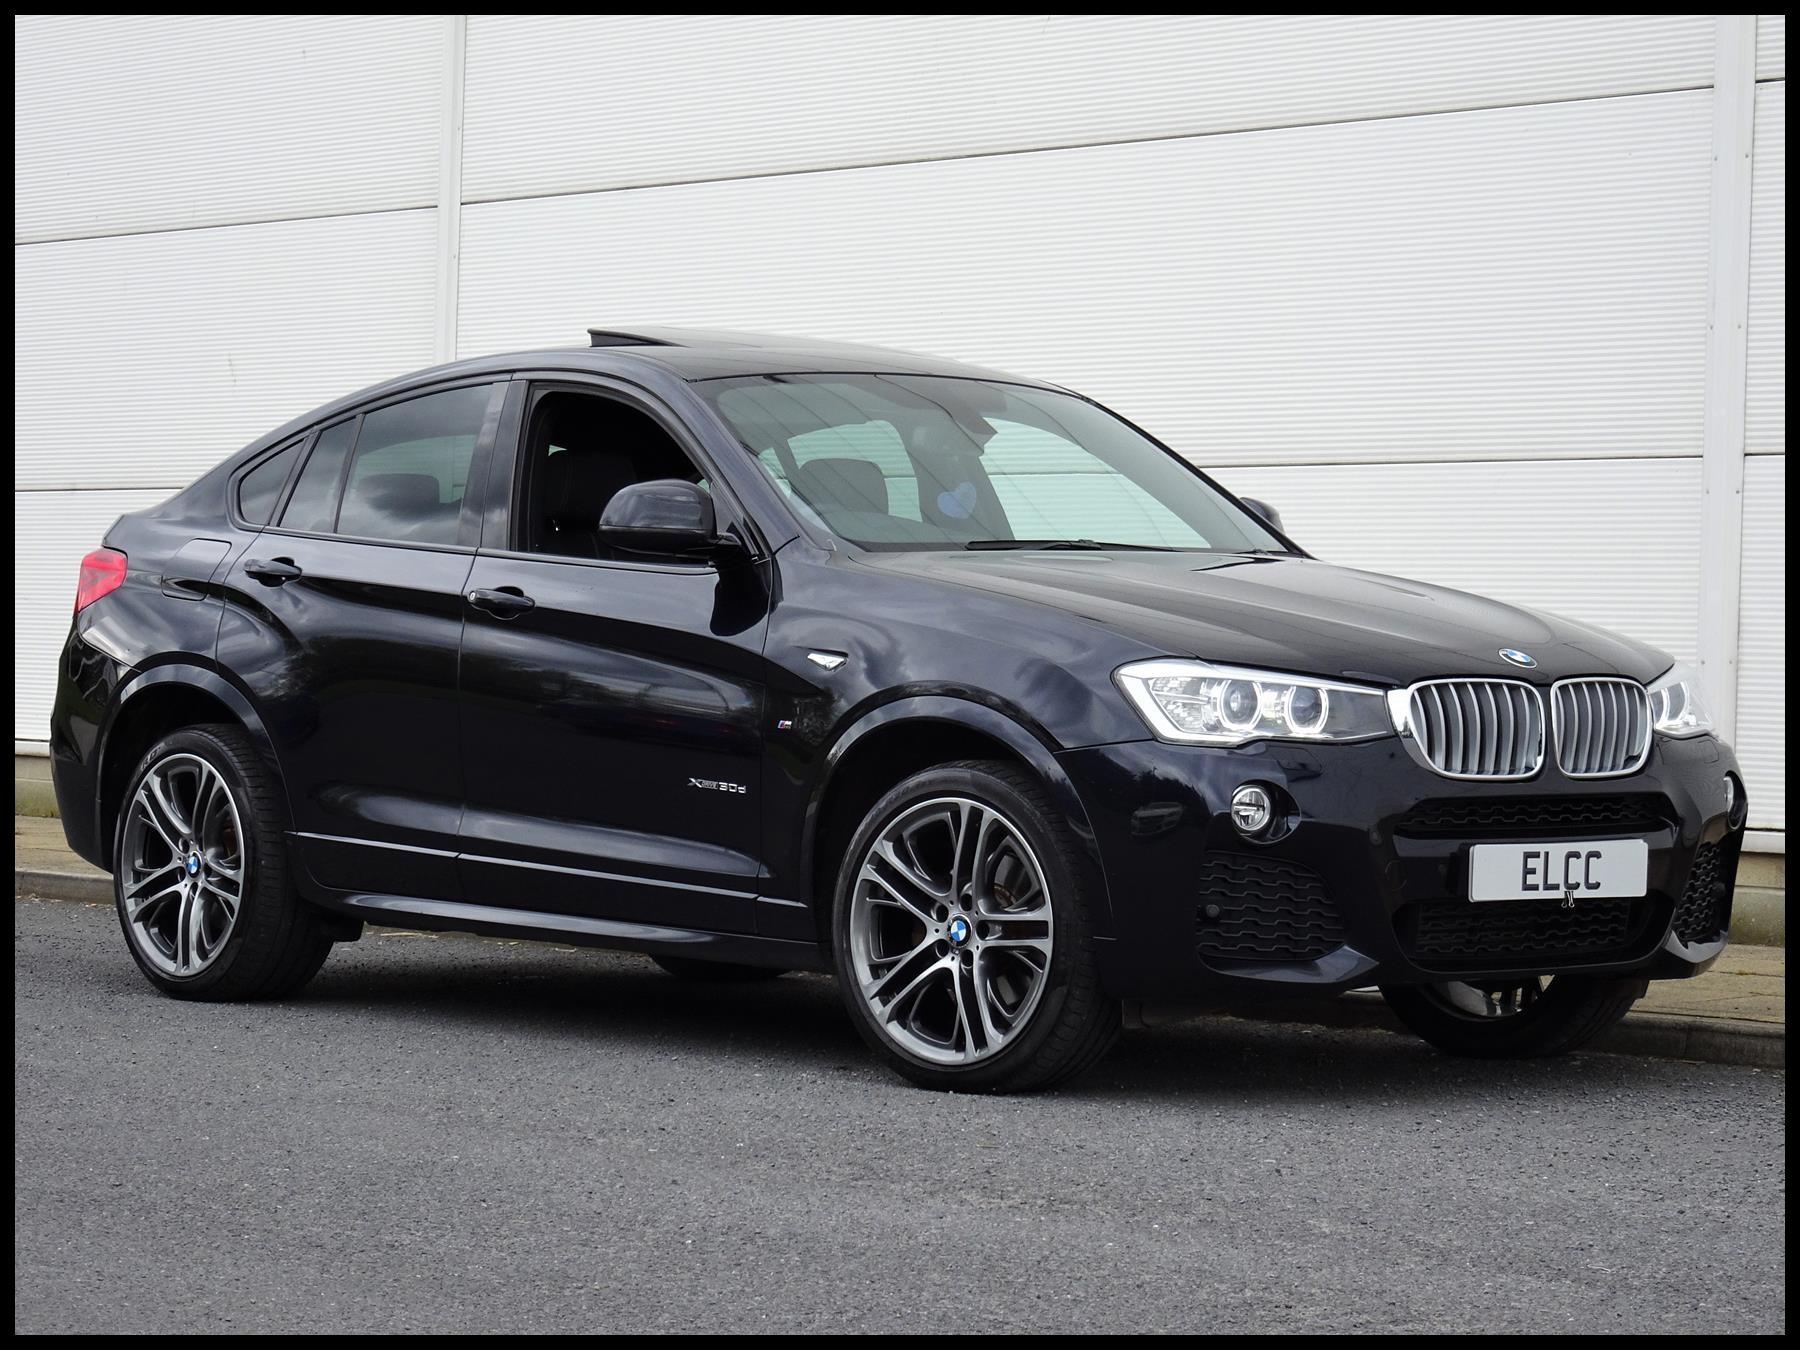 2014 BMW X4 30d M SPORT XDRIVE 3 0 258PS AUTO HUGE SPEC PRO NAV HEADS UP PANROOF ELECTRIC MEMORY SEATS 20 S FBMWSH 2014